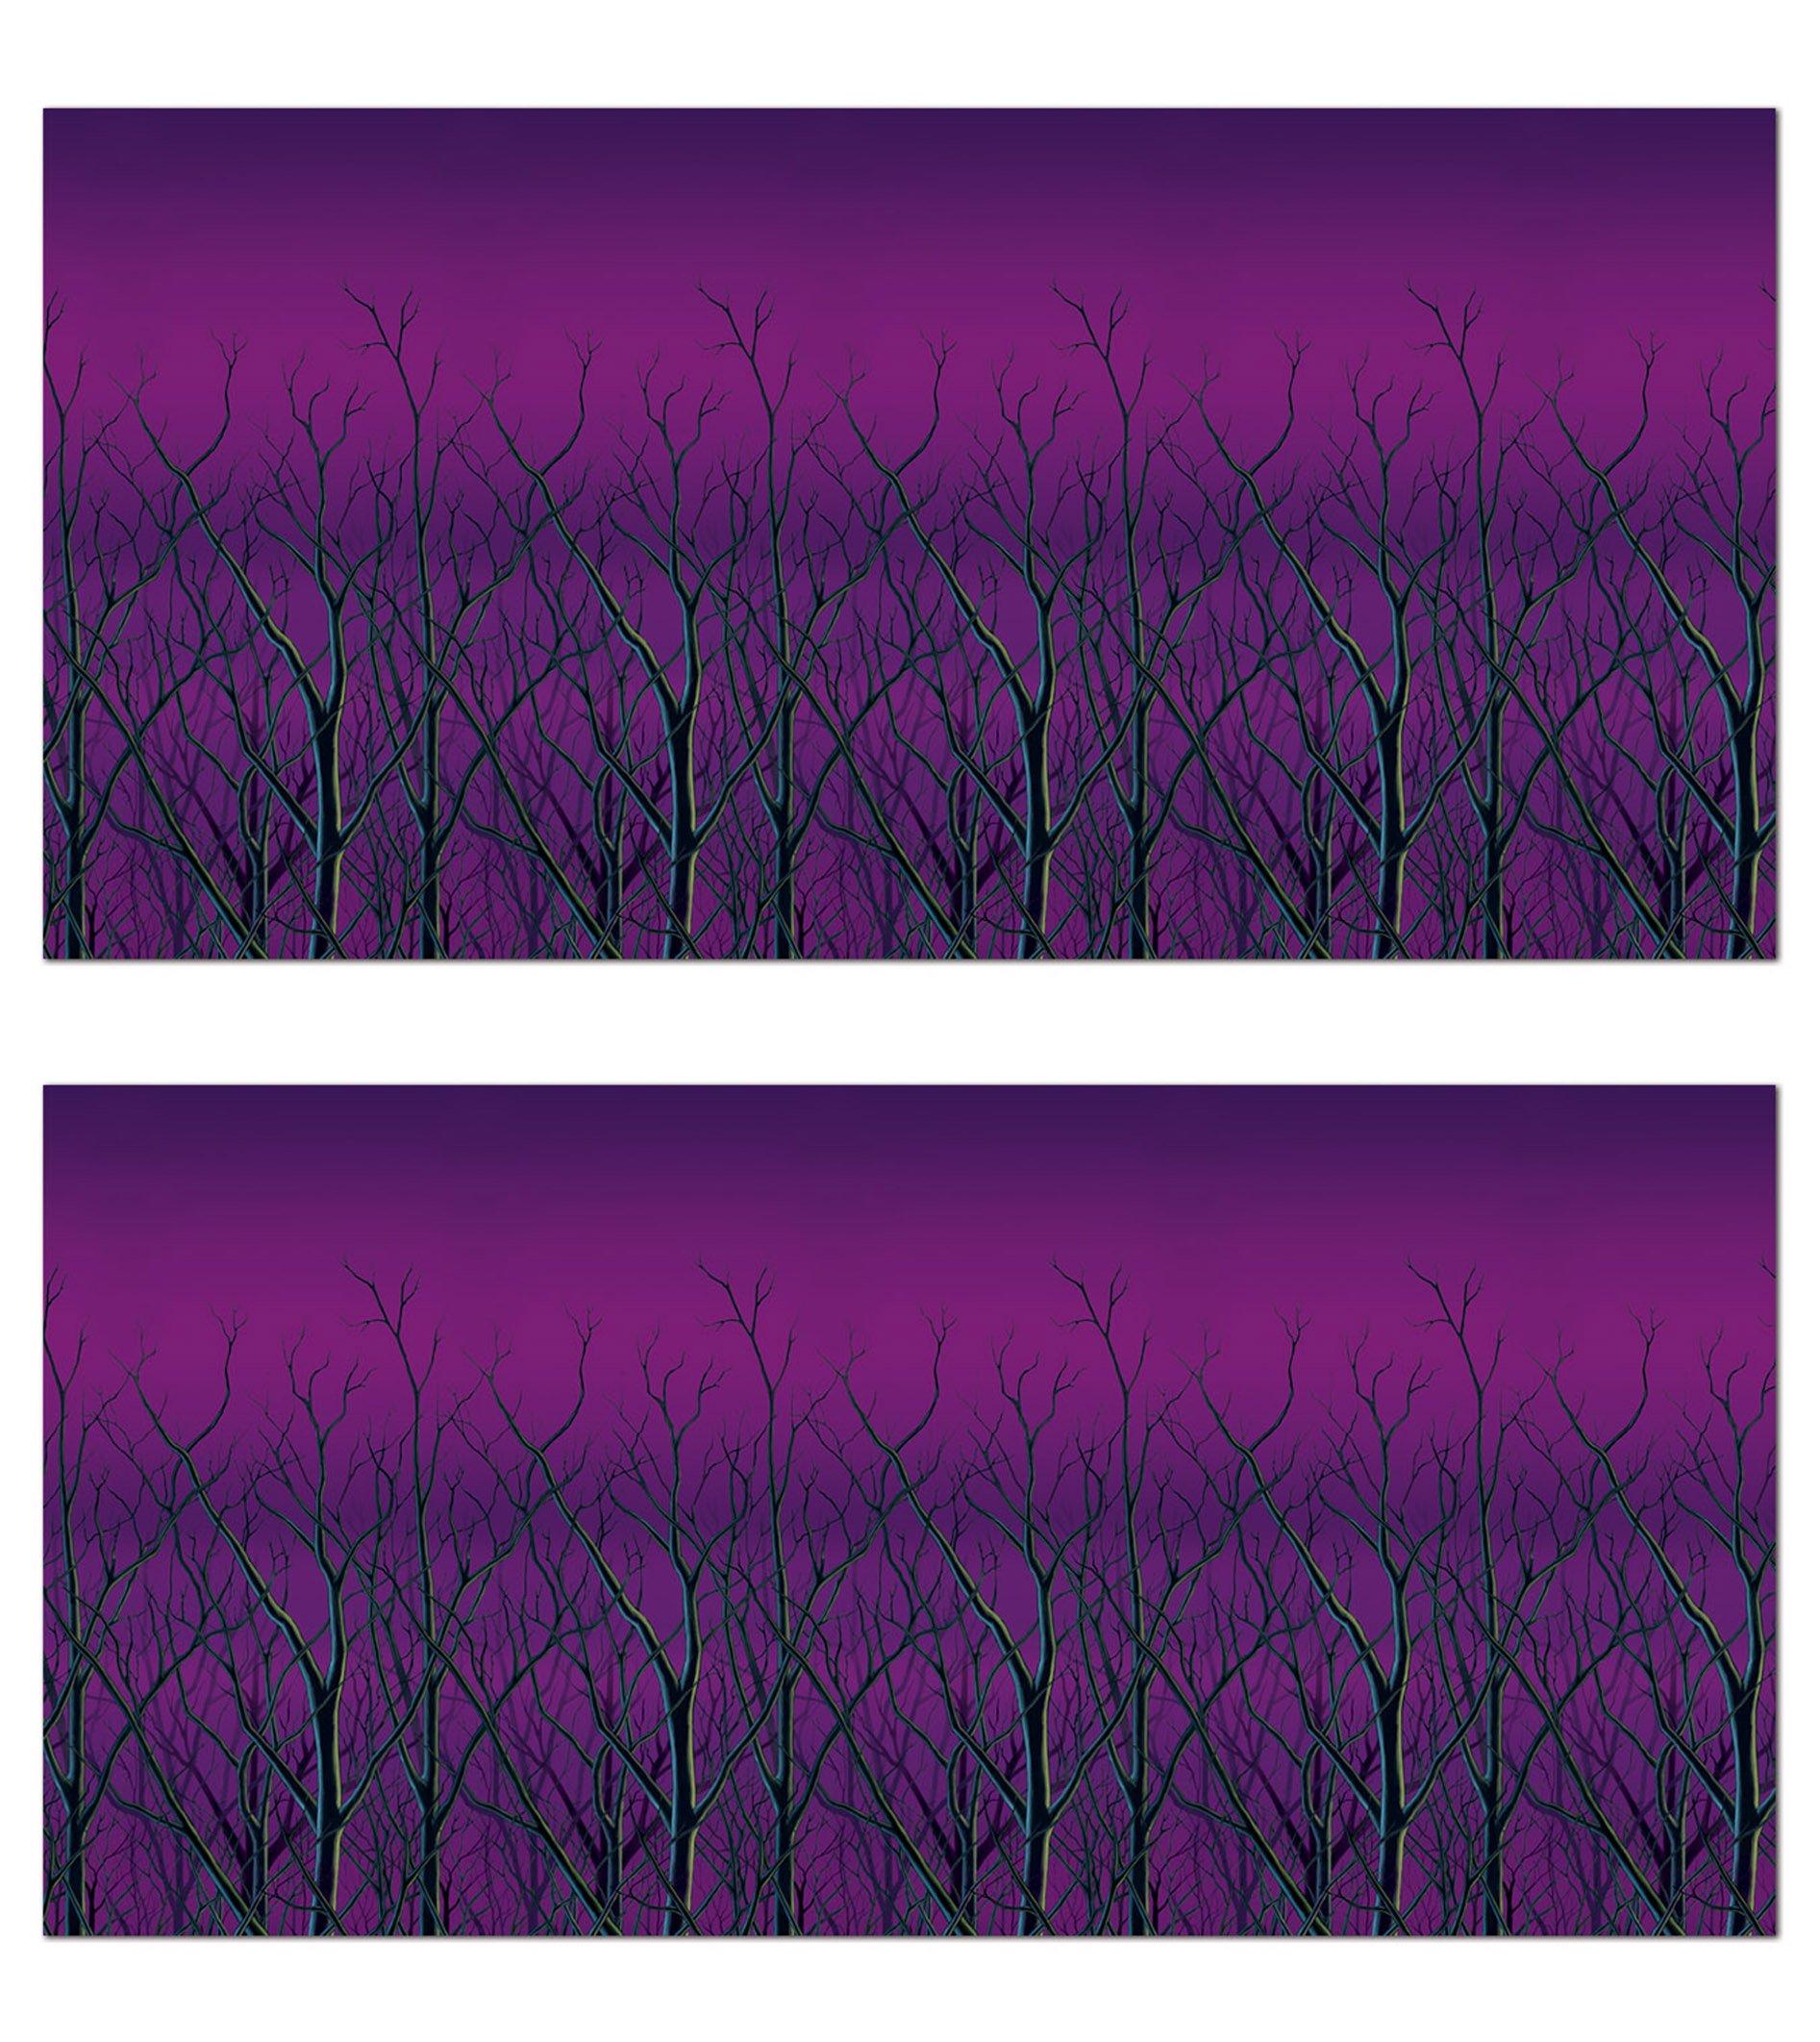 Beistle S00987AZ2, 2 Piece Spooky Forest Treetops Backdrops, 4' x 30' by Beistle